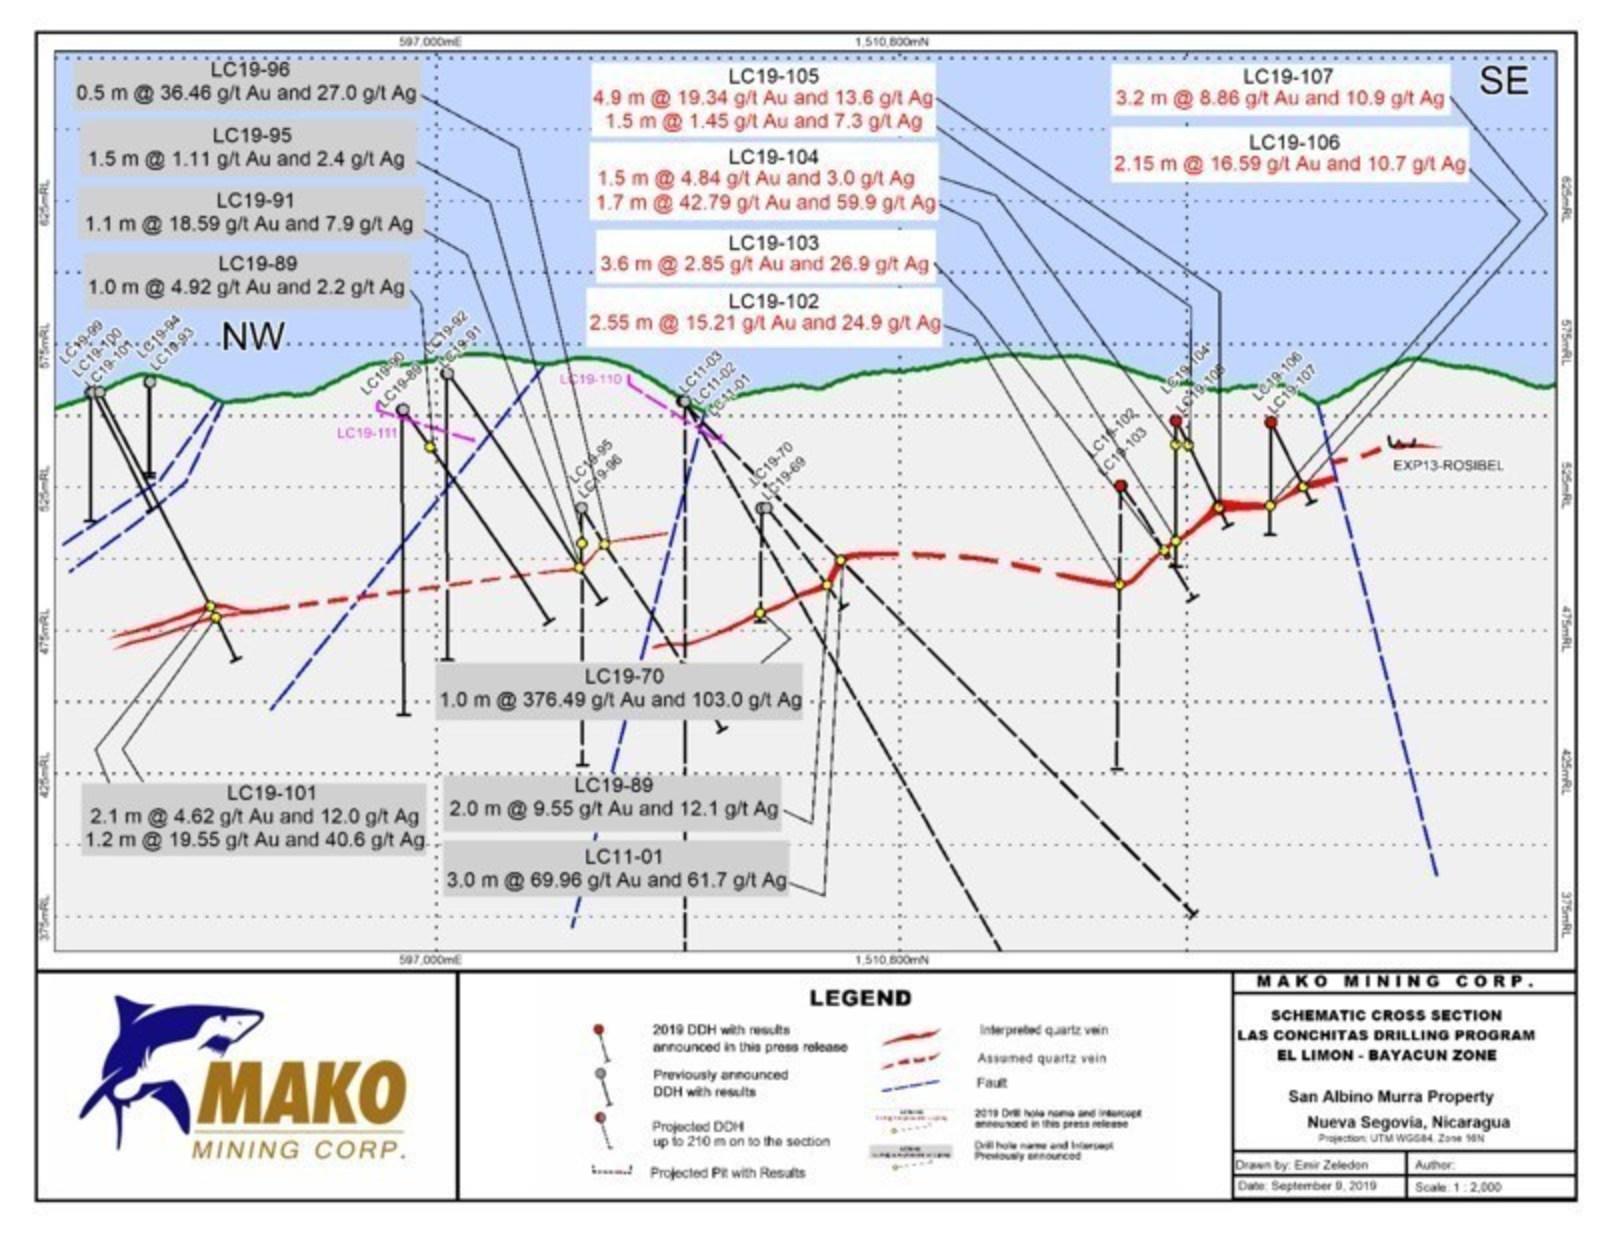 SCHEMATIC CROSS SECTION - EL LIMON - BAYACUN ZONE - FINAL